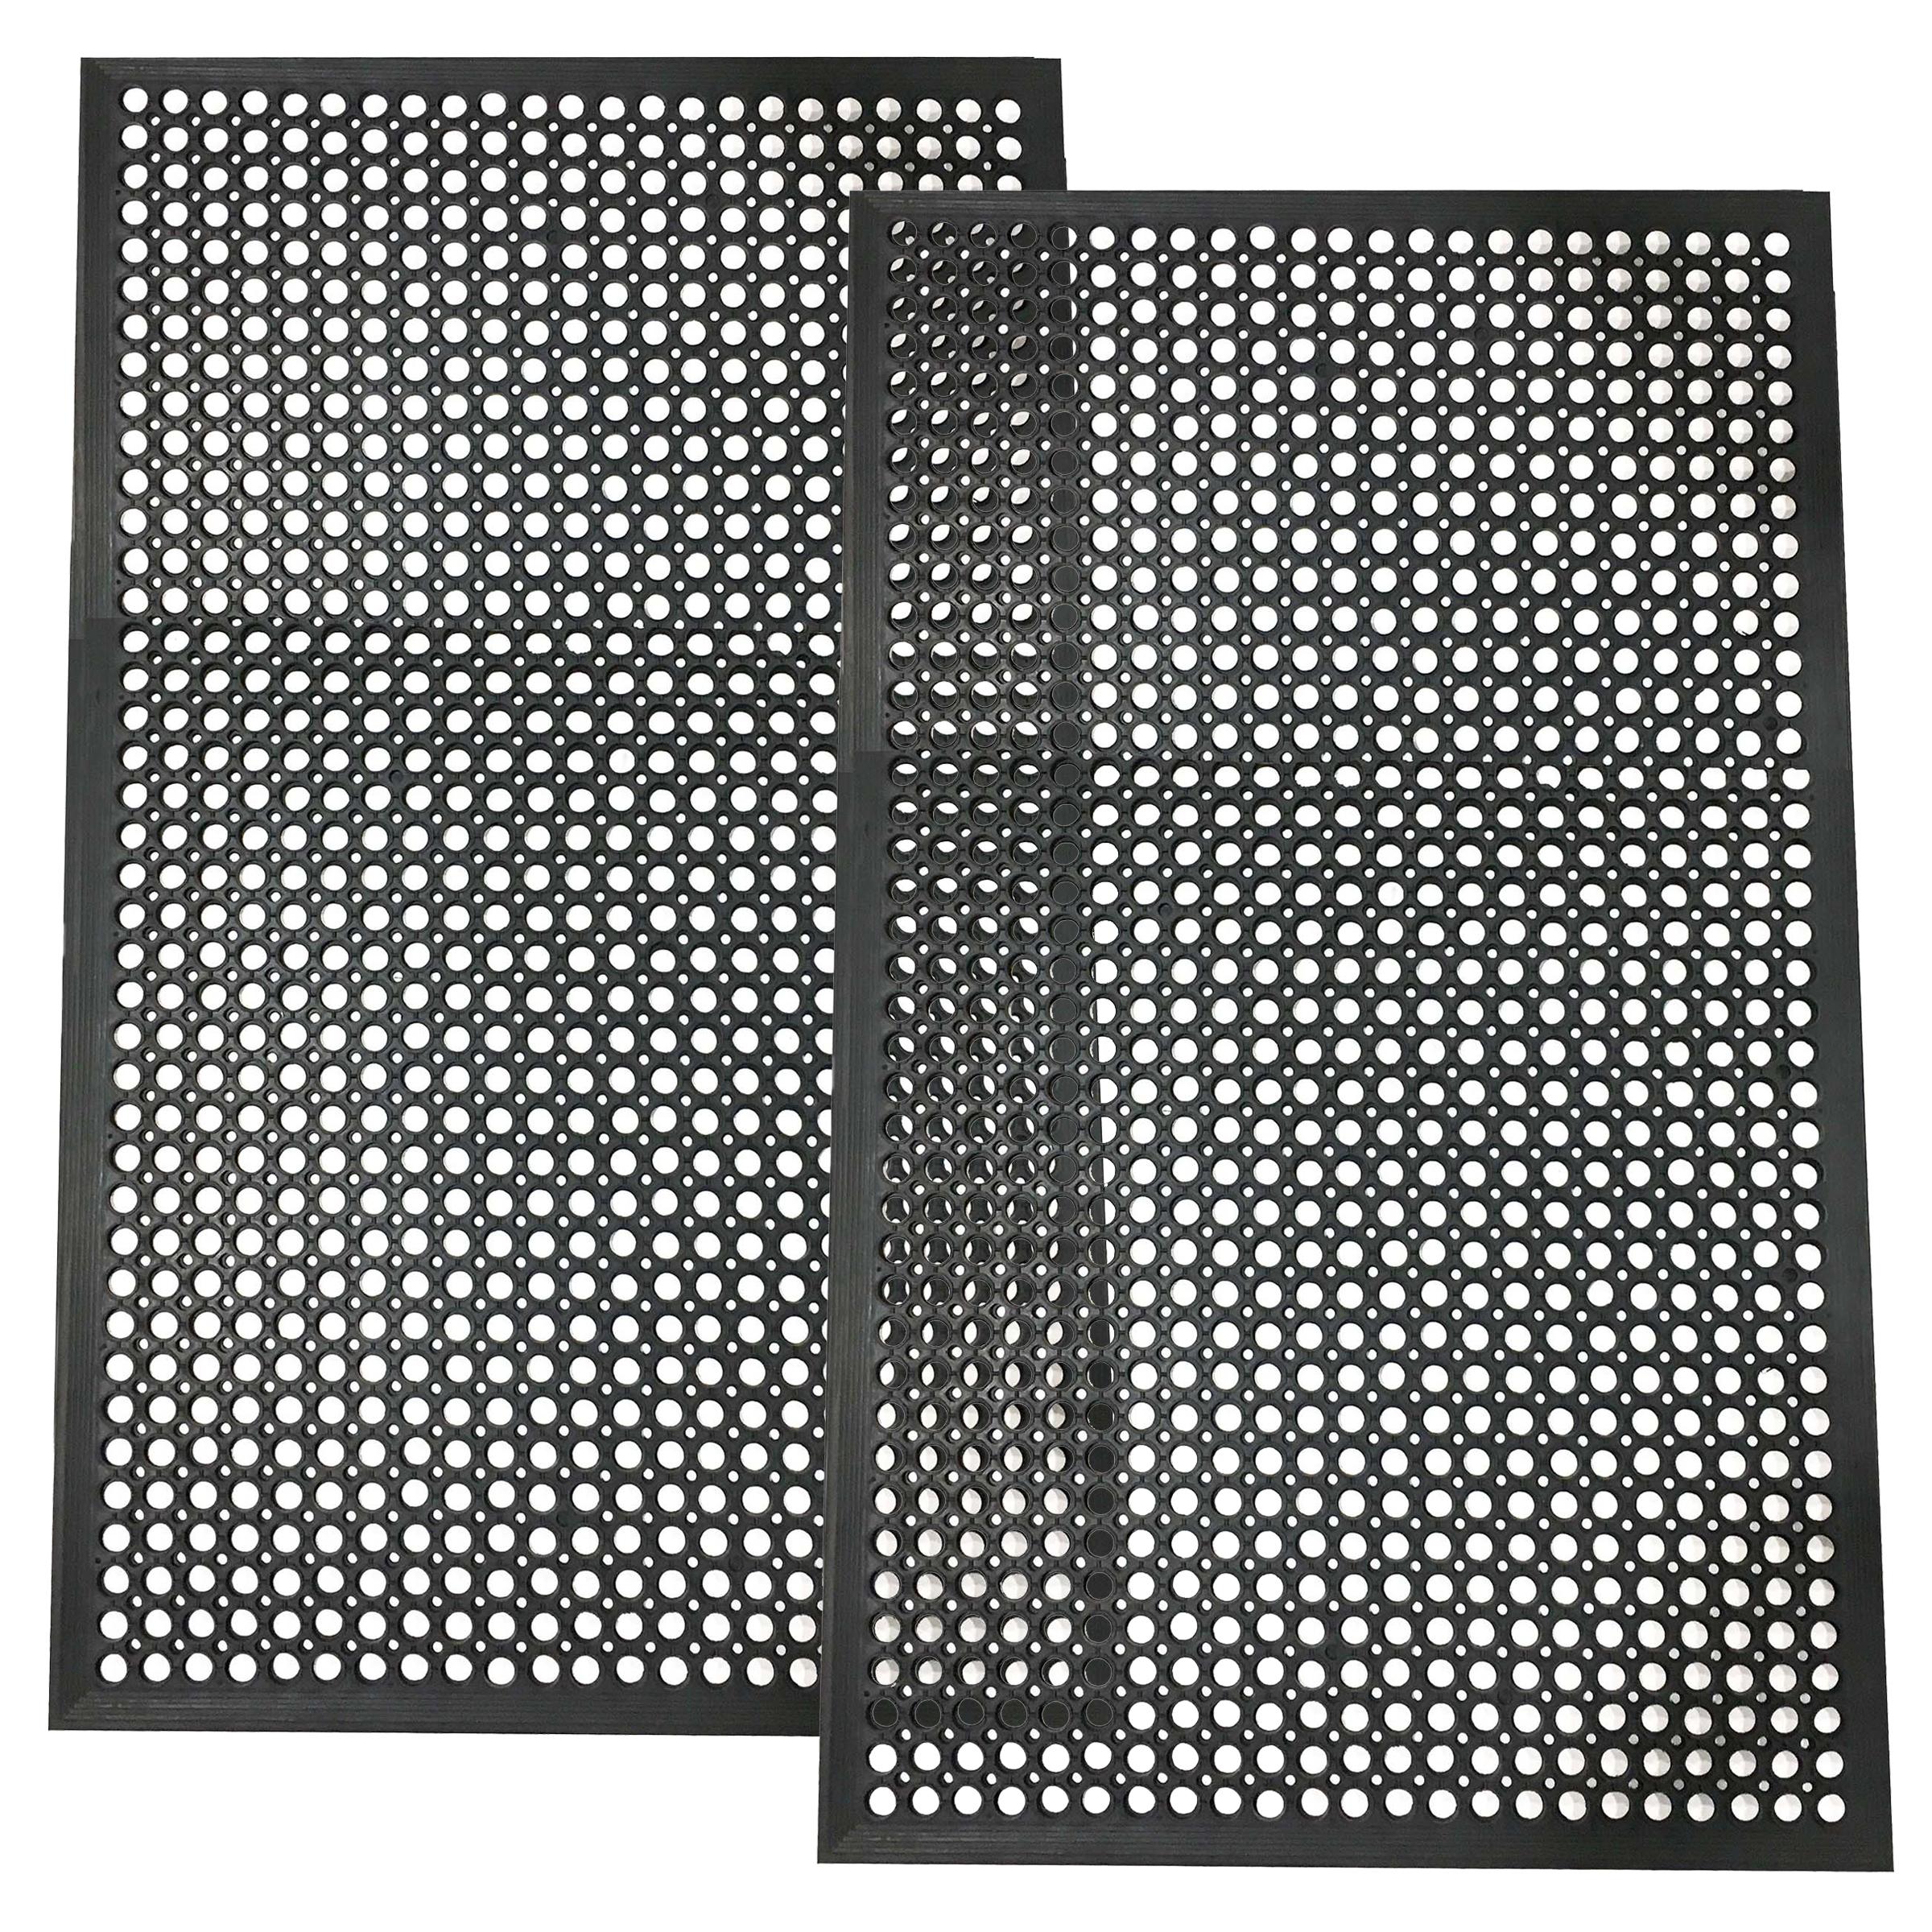 Buffalo Tools 3 x 5 Foot Industrial Rubber Floor Mat - 2Pk